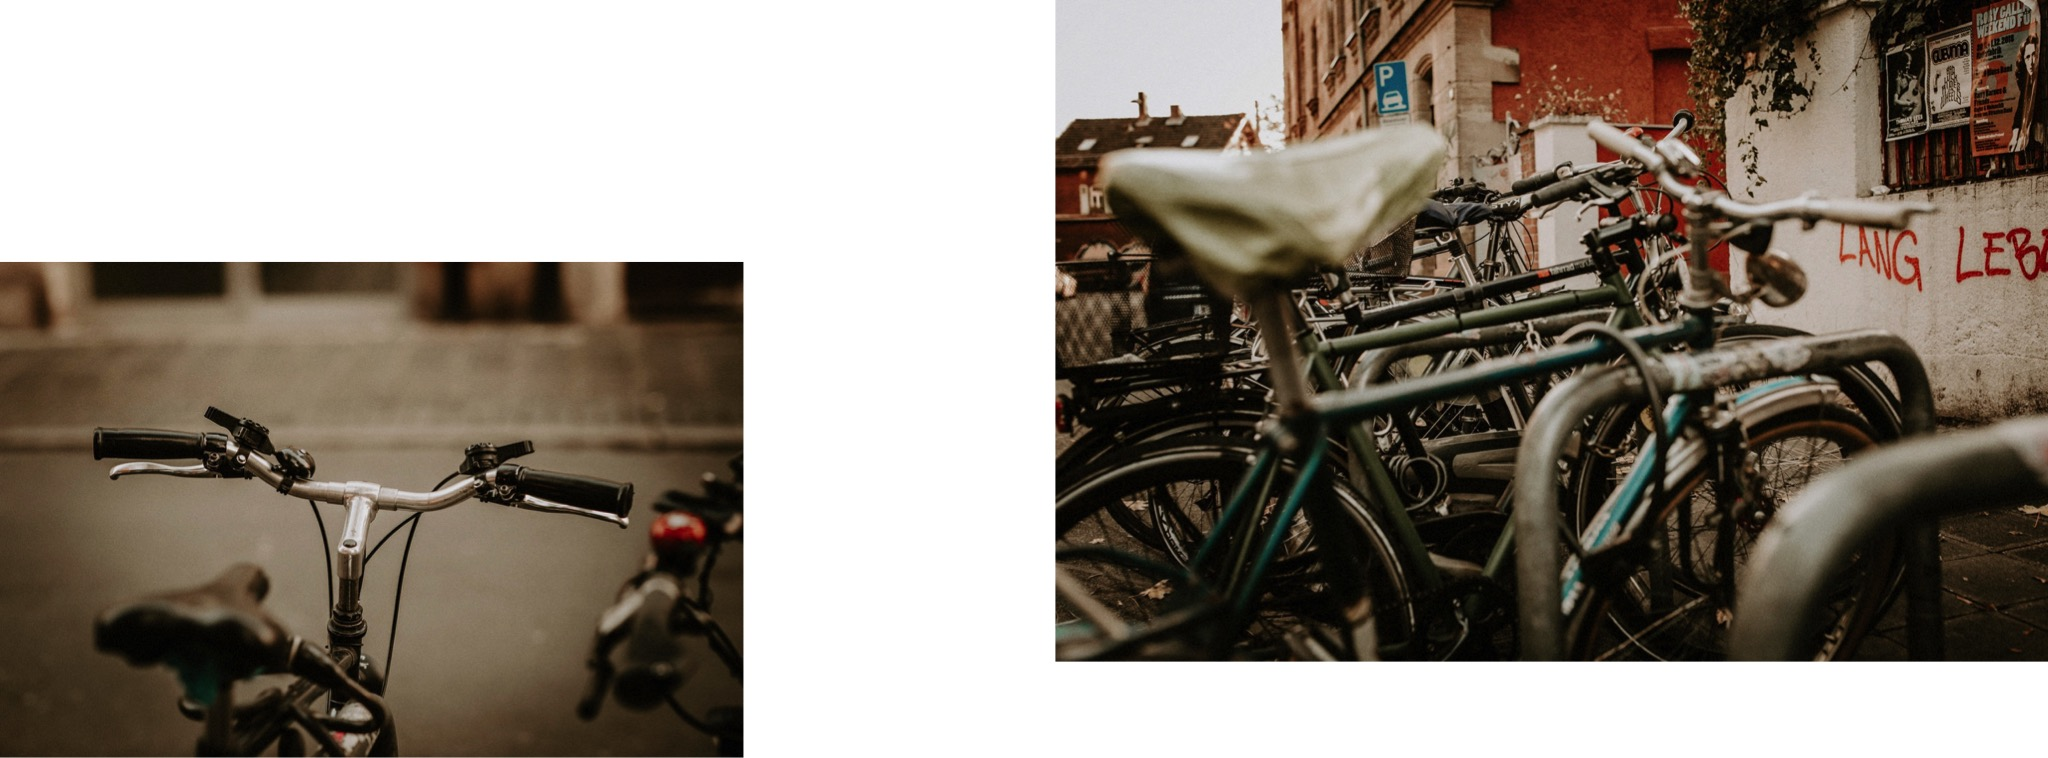 02_Carina & Fabian - Paarshooting-3_Carina & Fabian - Paarshooting-2_hochzeit_paarshooting_hochzeitsfotograf_nürnberg_intimatecouple.jpg